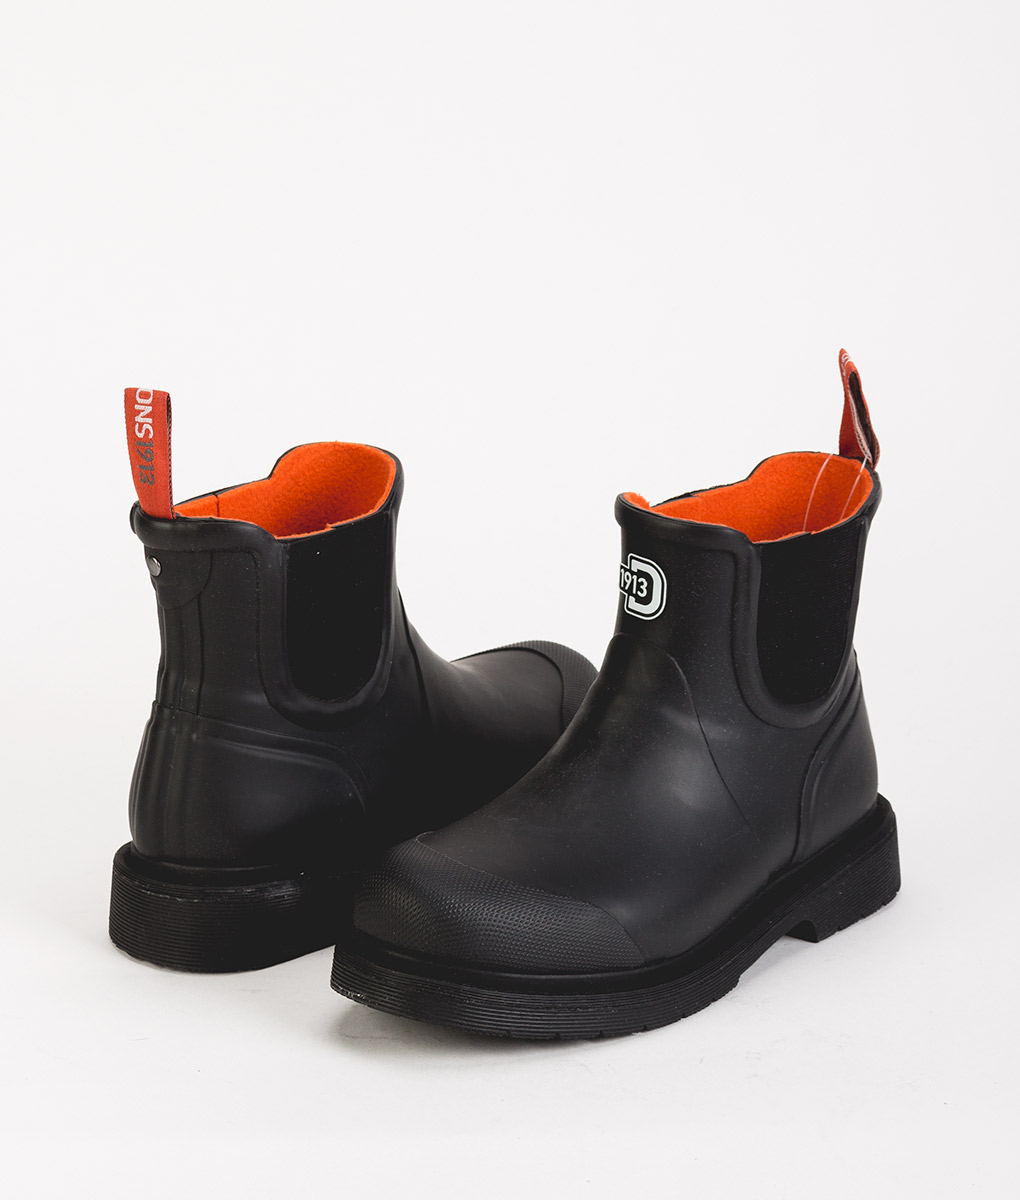 DIDRIKSONS Women Rain Boots 500691 VINGA, Black 89.99 2